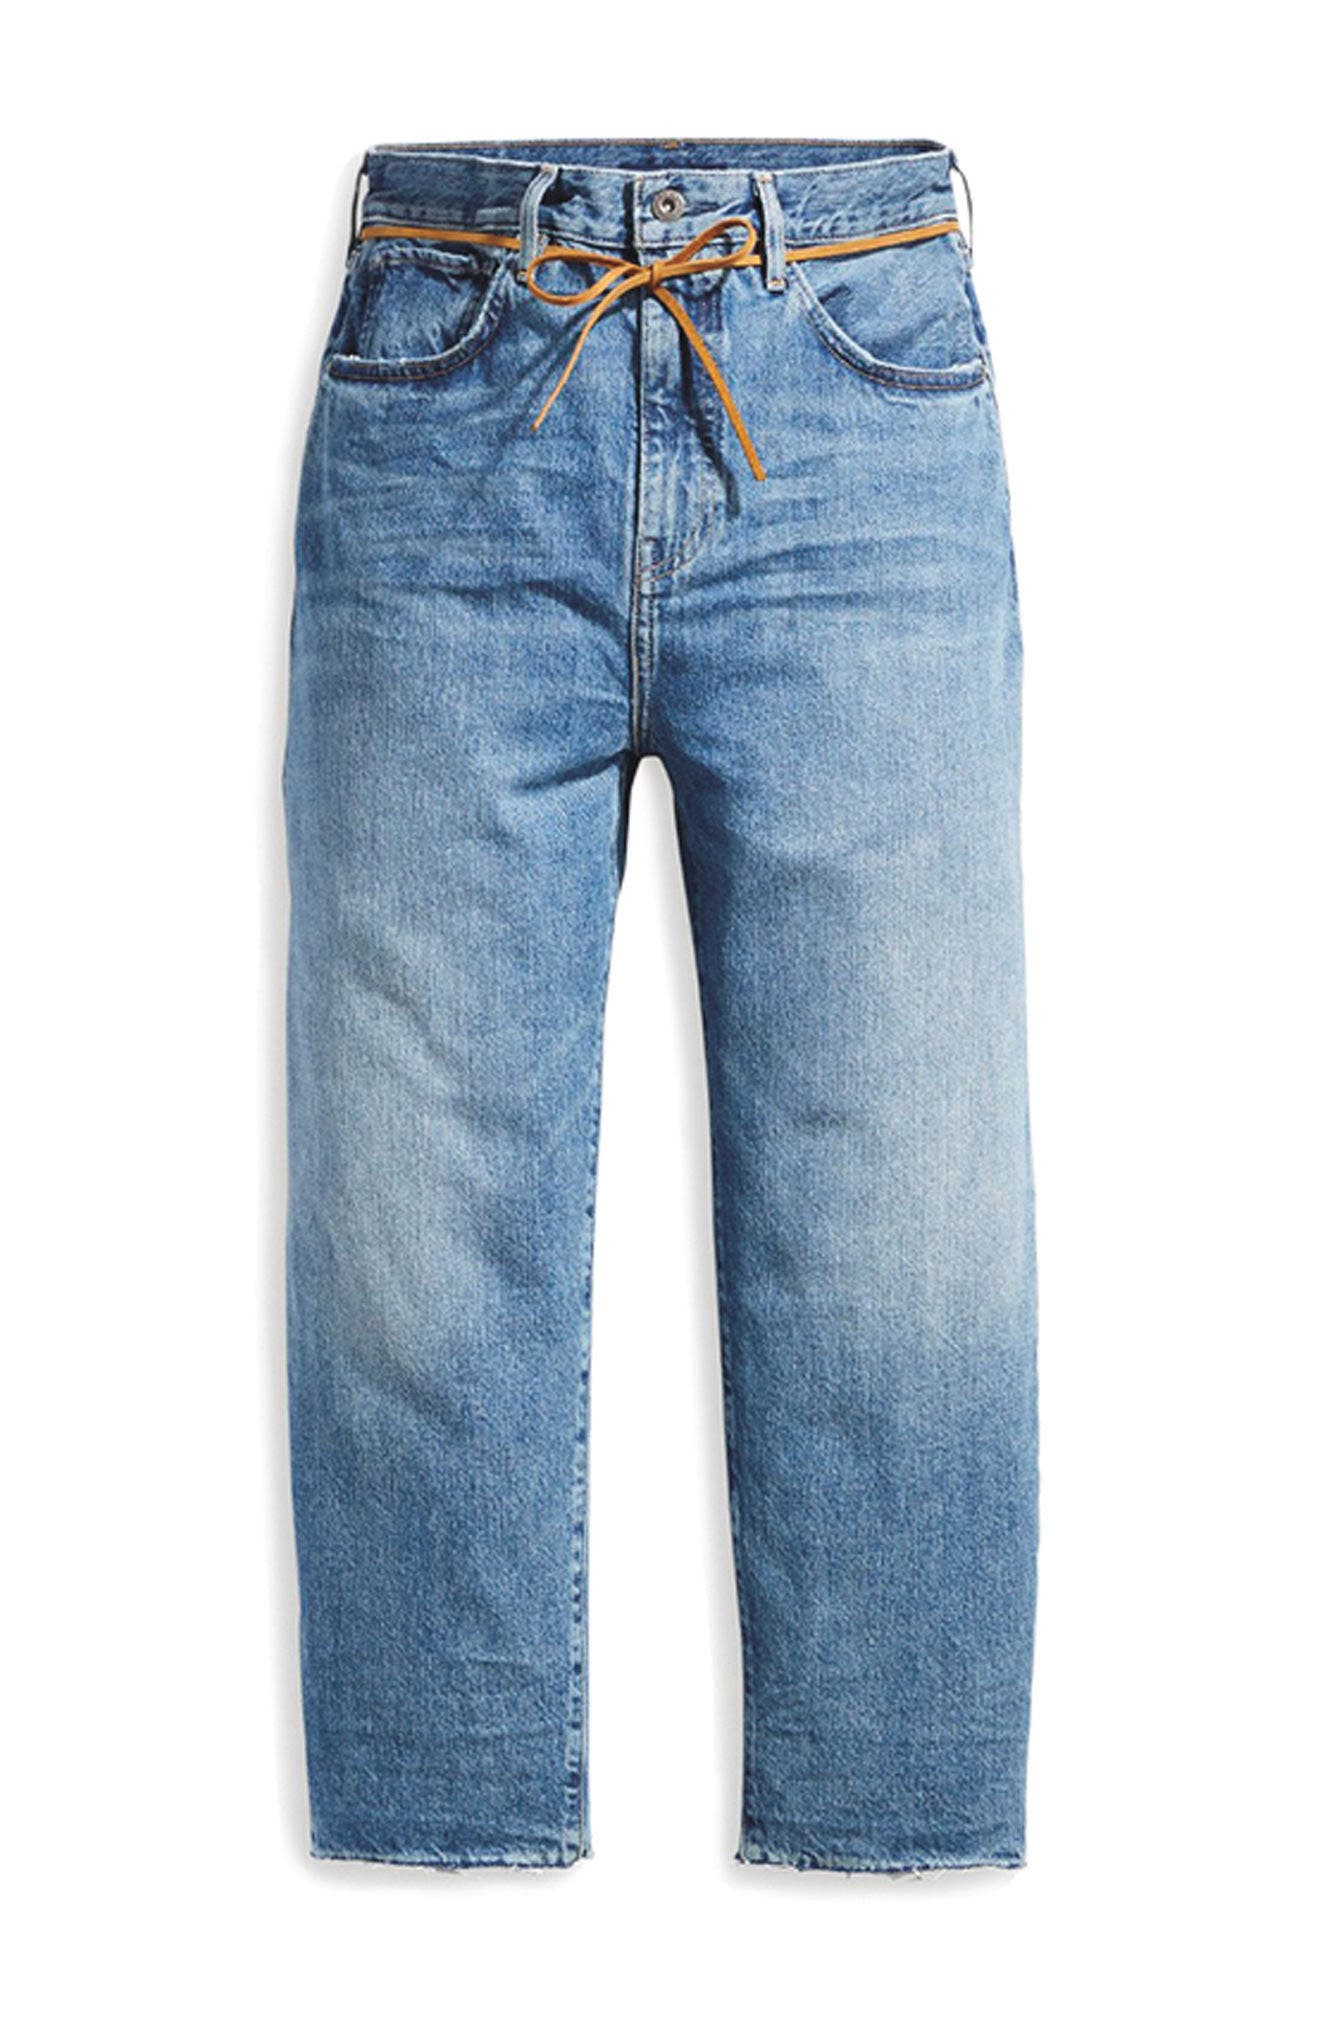 Barrel Jeans,                             Alternate thumbnail 8, color,                             420